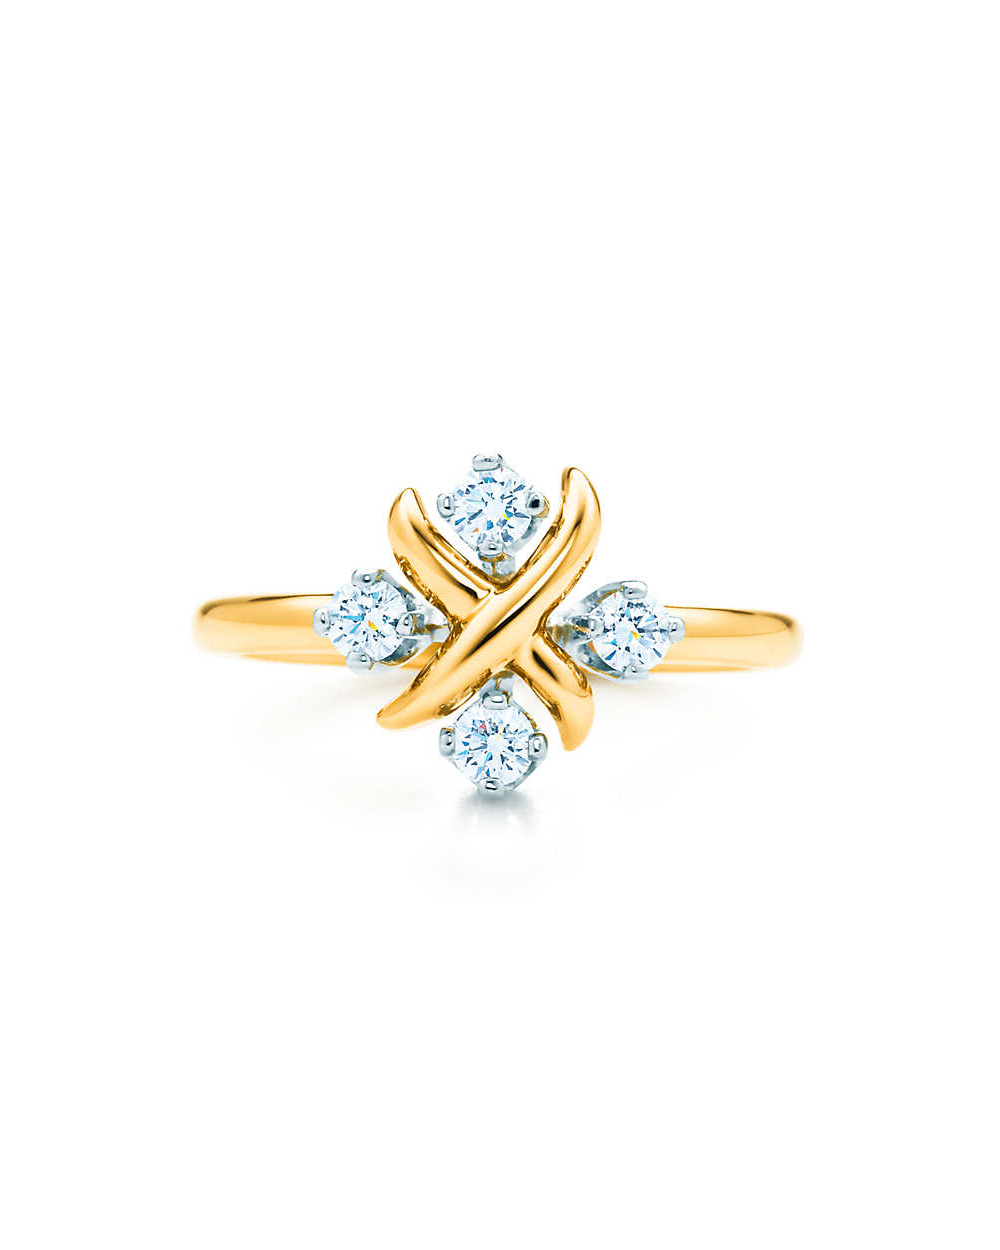 Lynn Ring 18k gold and platinum round diamonds